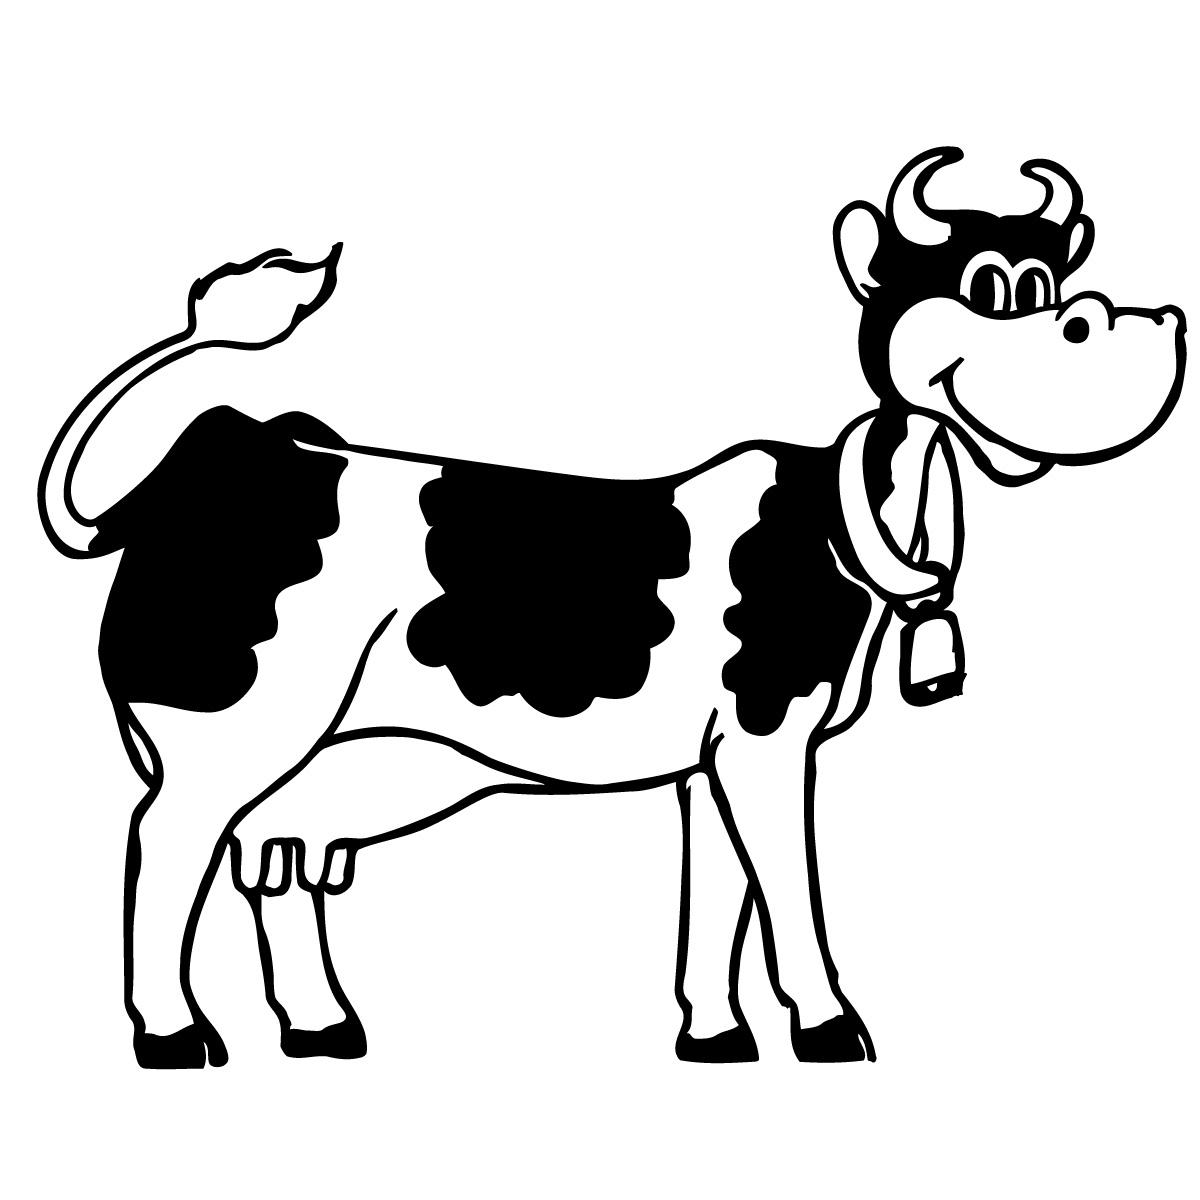 Cow Clip Art Black And White Clipart Panda